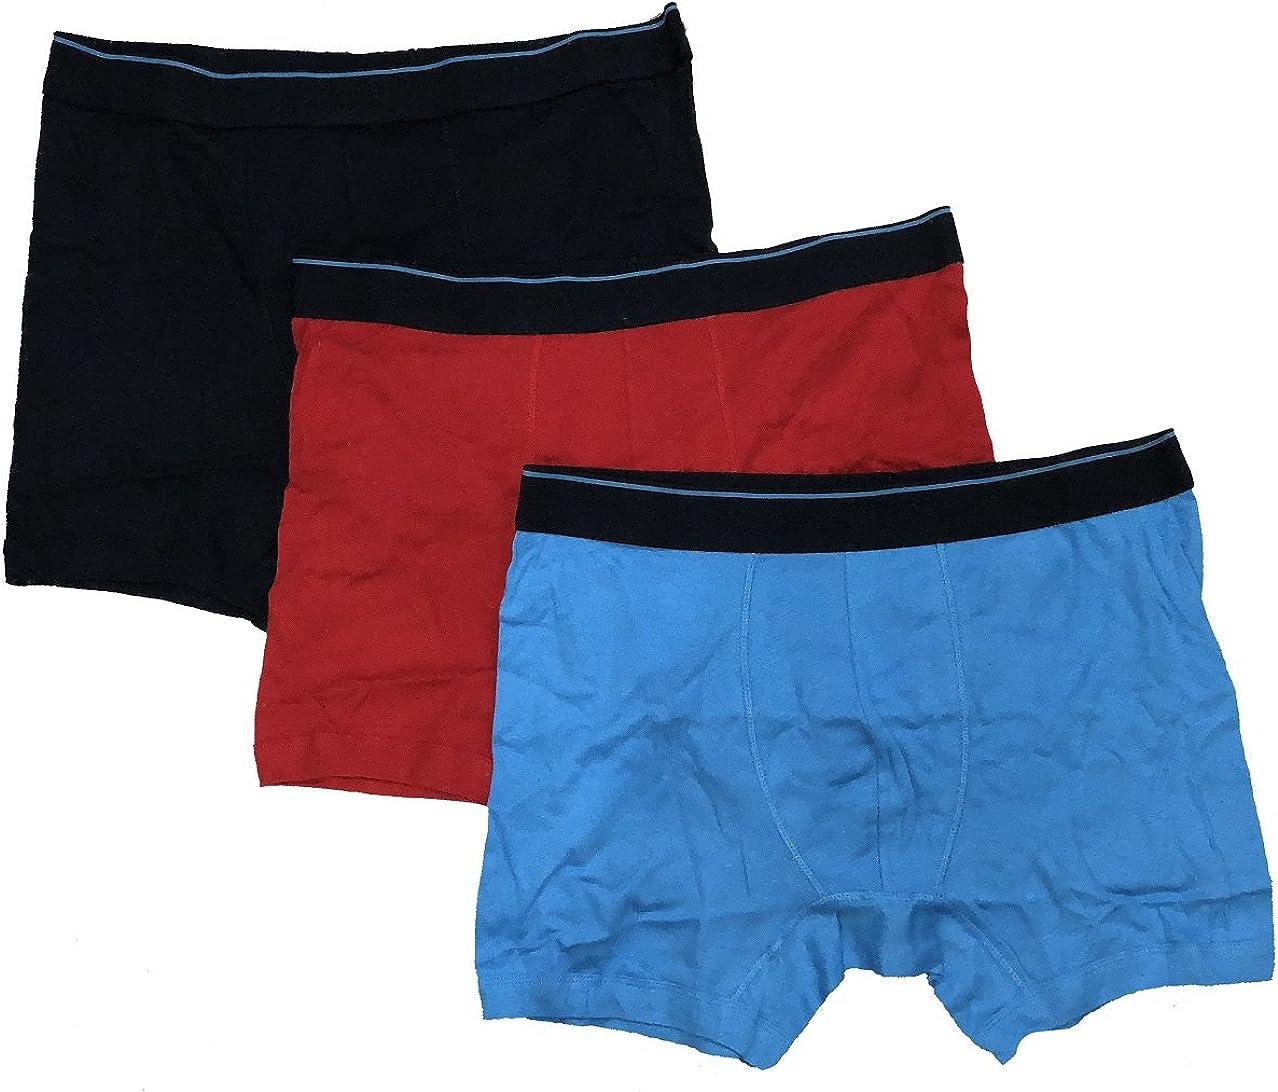 U.S. Polo Assn. Men's 3-Pack Stretch Trunks Cotton Boxer Briefs